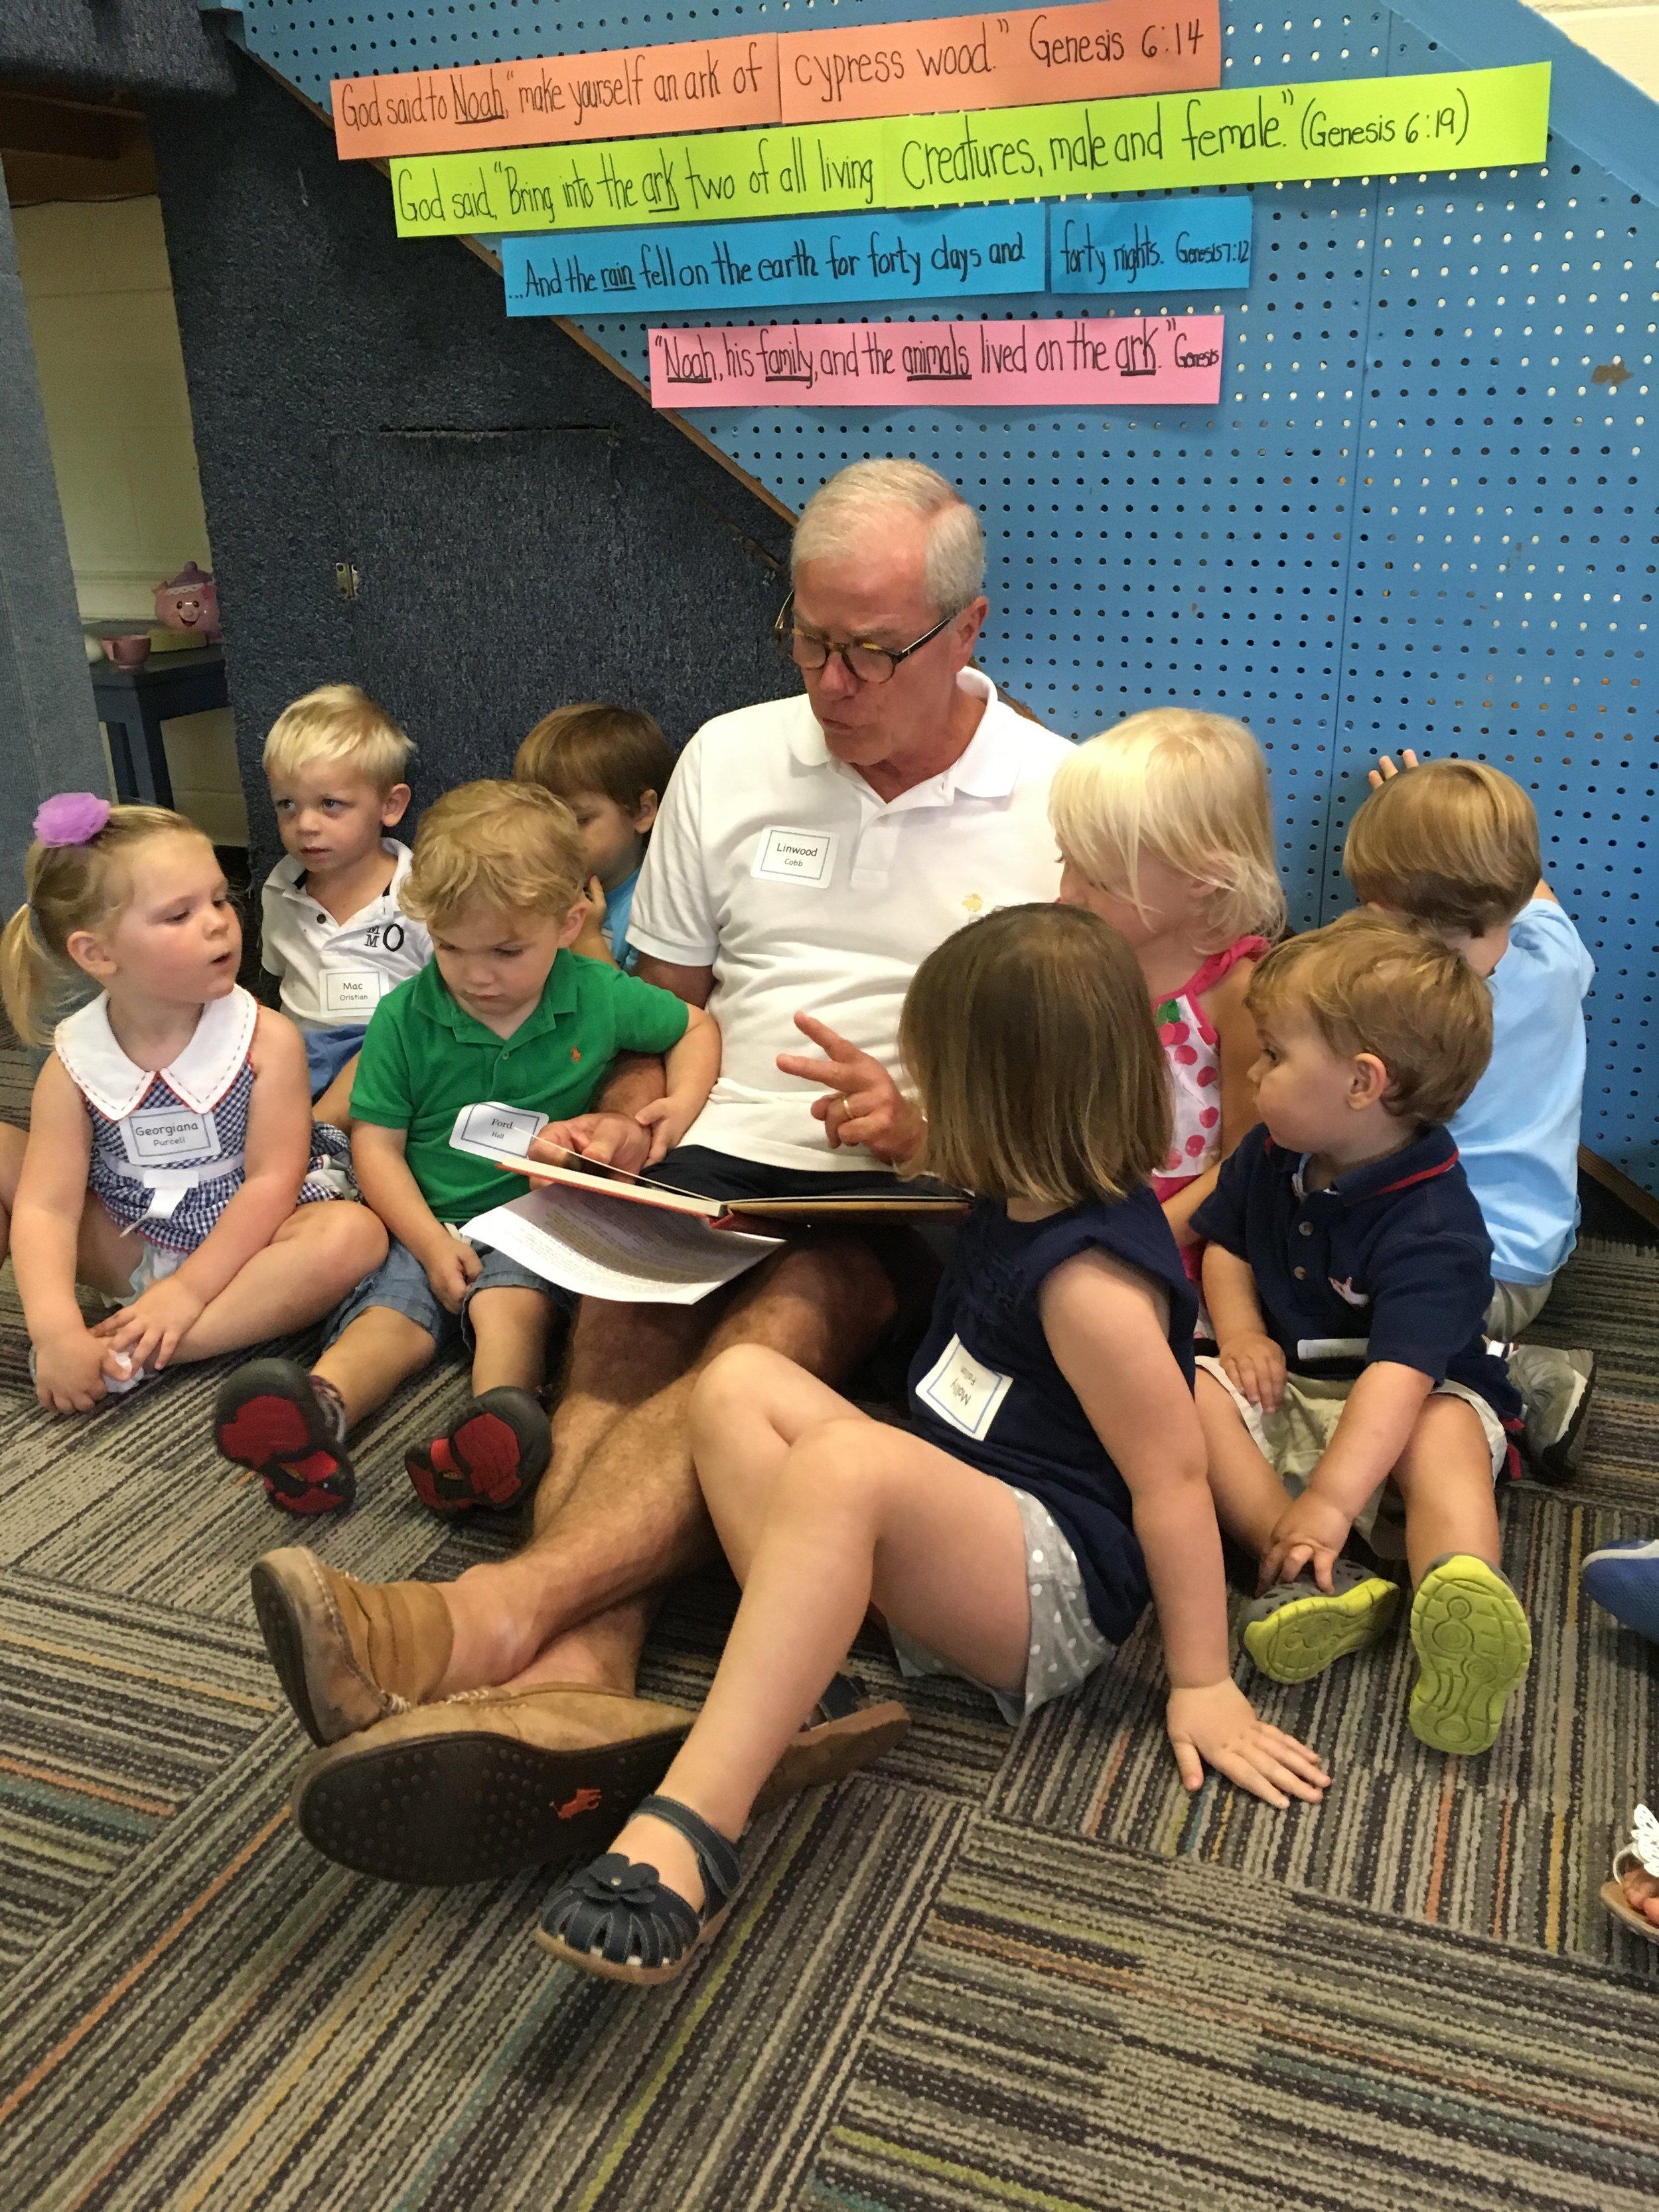 Linwood with Summer Kids.JPG